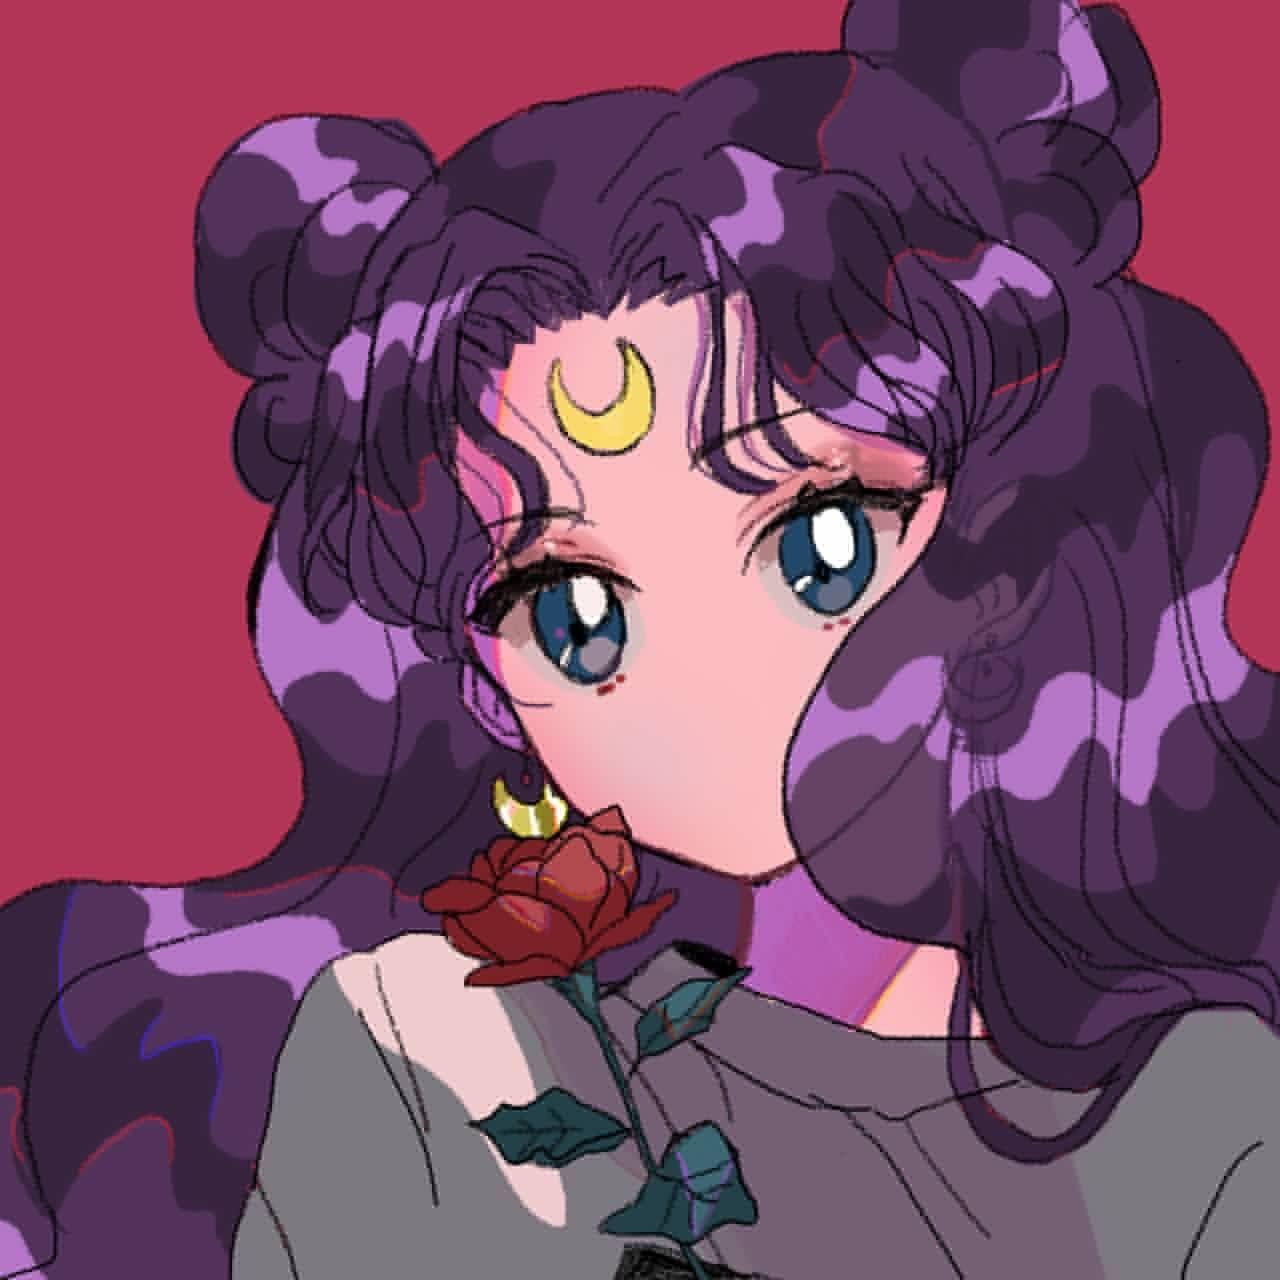 𝐼𝑚𝑎𝑔𝑒𝑛 𝑘𝑎𝑤𝑎𝑖 ♡   Sailor moon aesthetic, Aesthetic ...